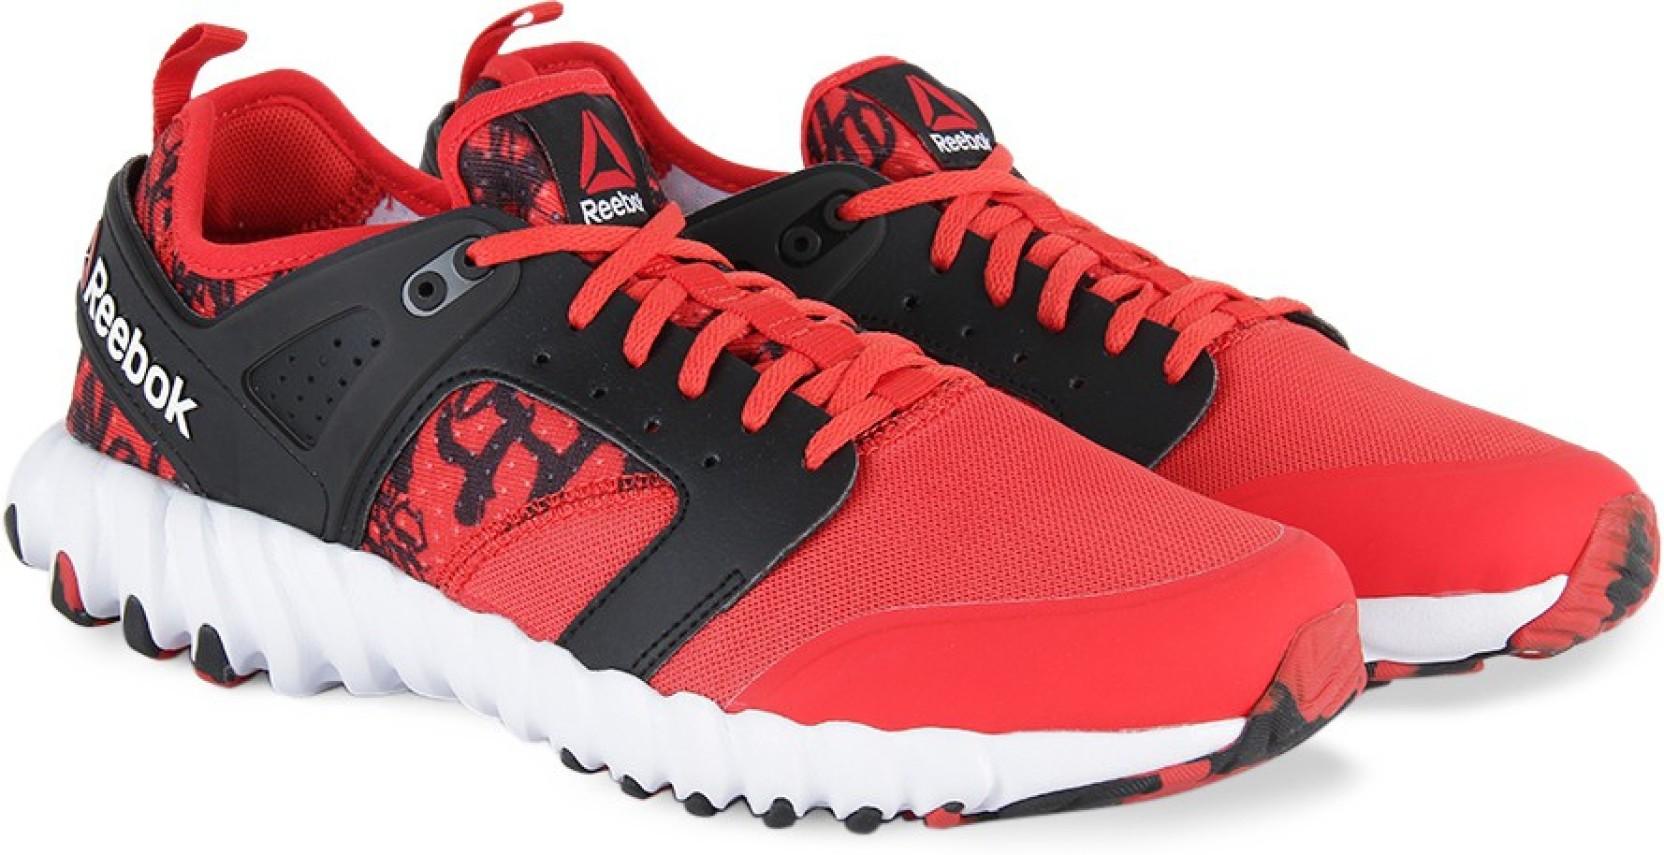 7e5448b8ebba REEBOK TWISTFORM 2.0 GR Men Running Shoes For Men - Buy RED BLACK ...